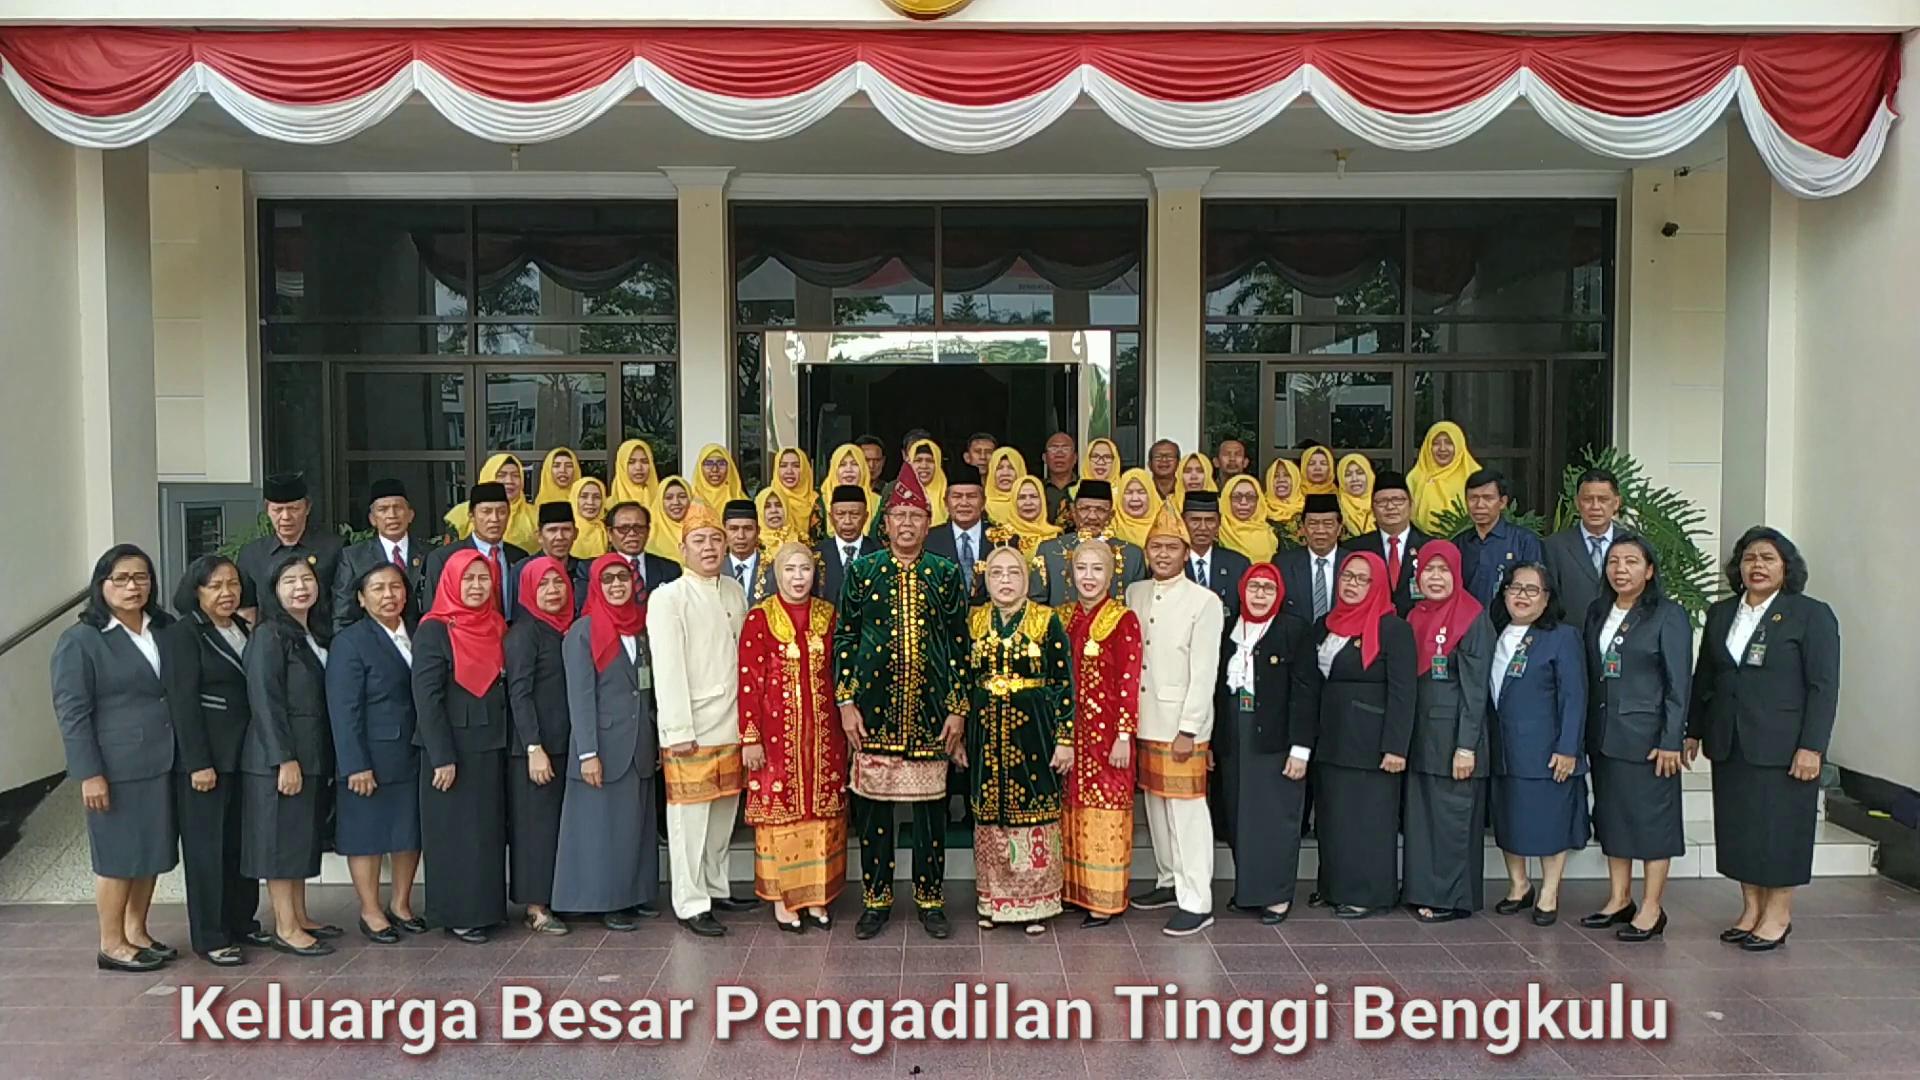 Dirgahayu ke 74 Mahkamah Agung Republik Indonesia